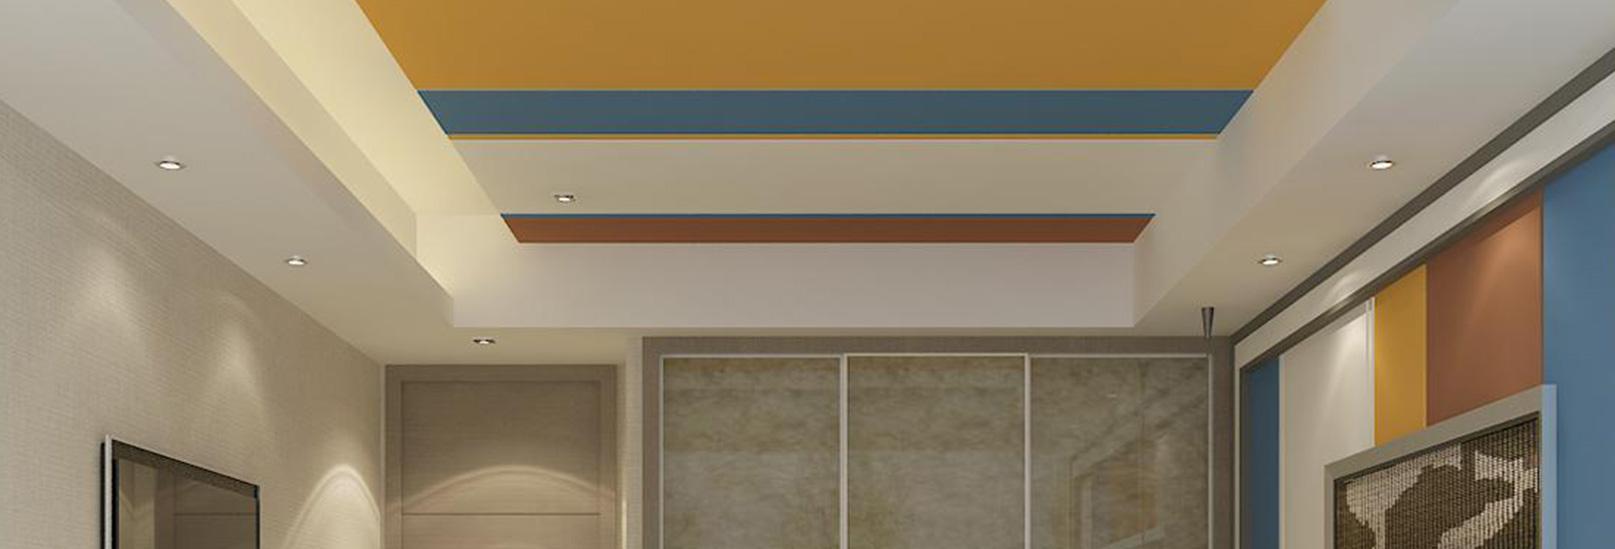 Choose Best False Ceiling Designs for Your Home